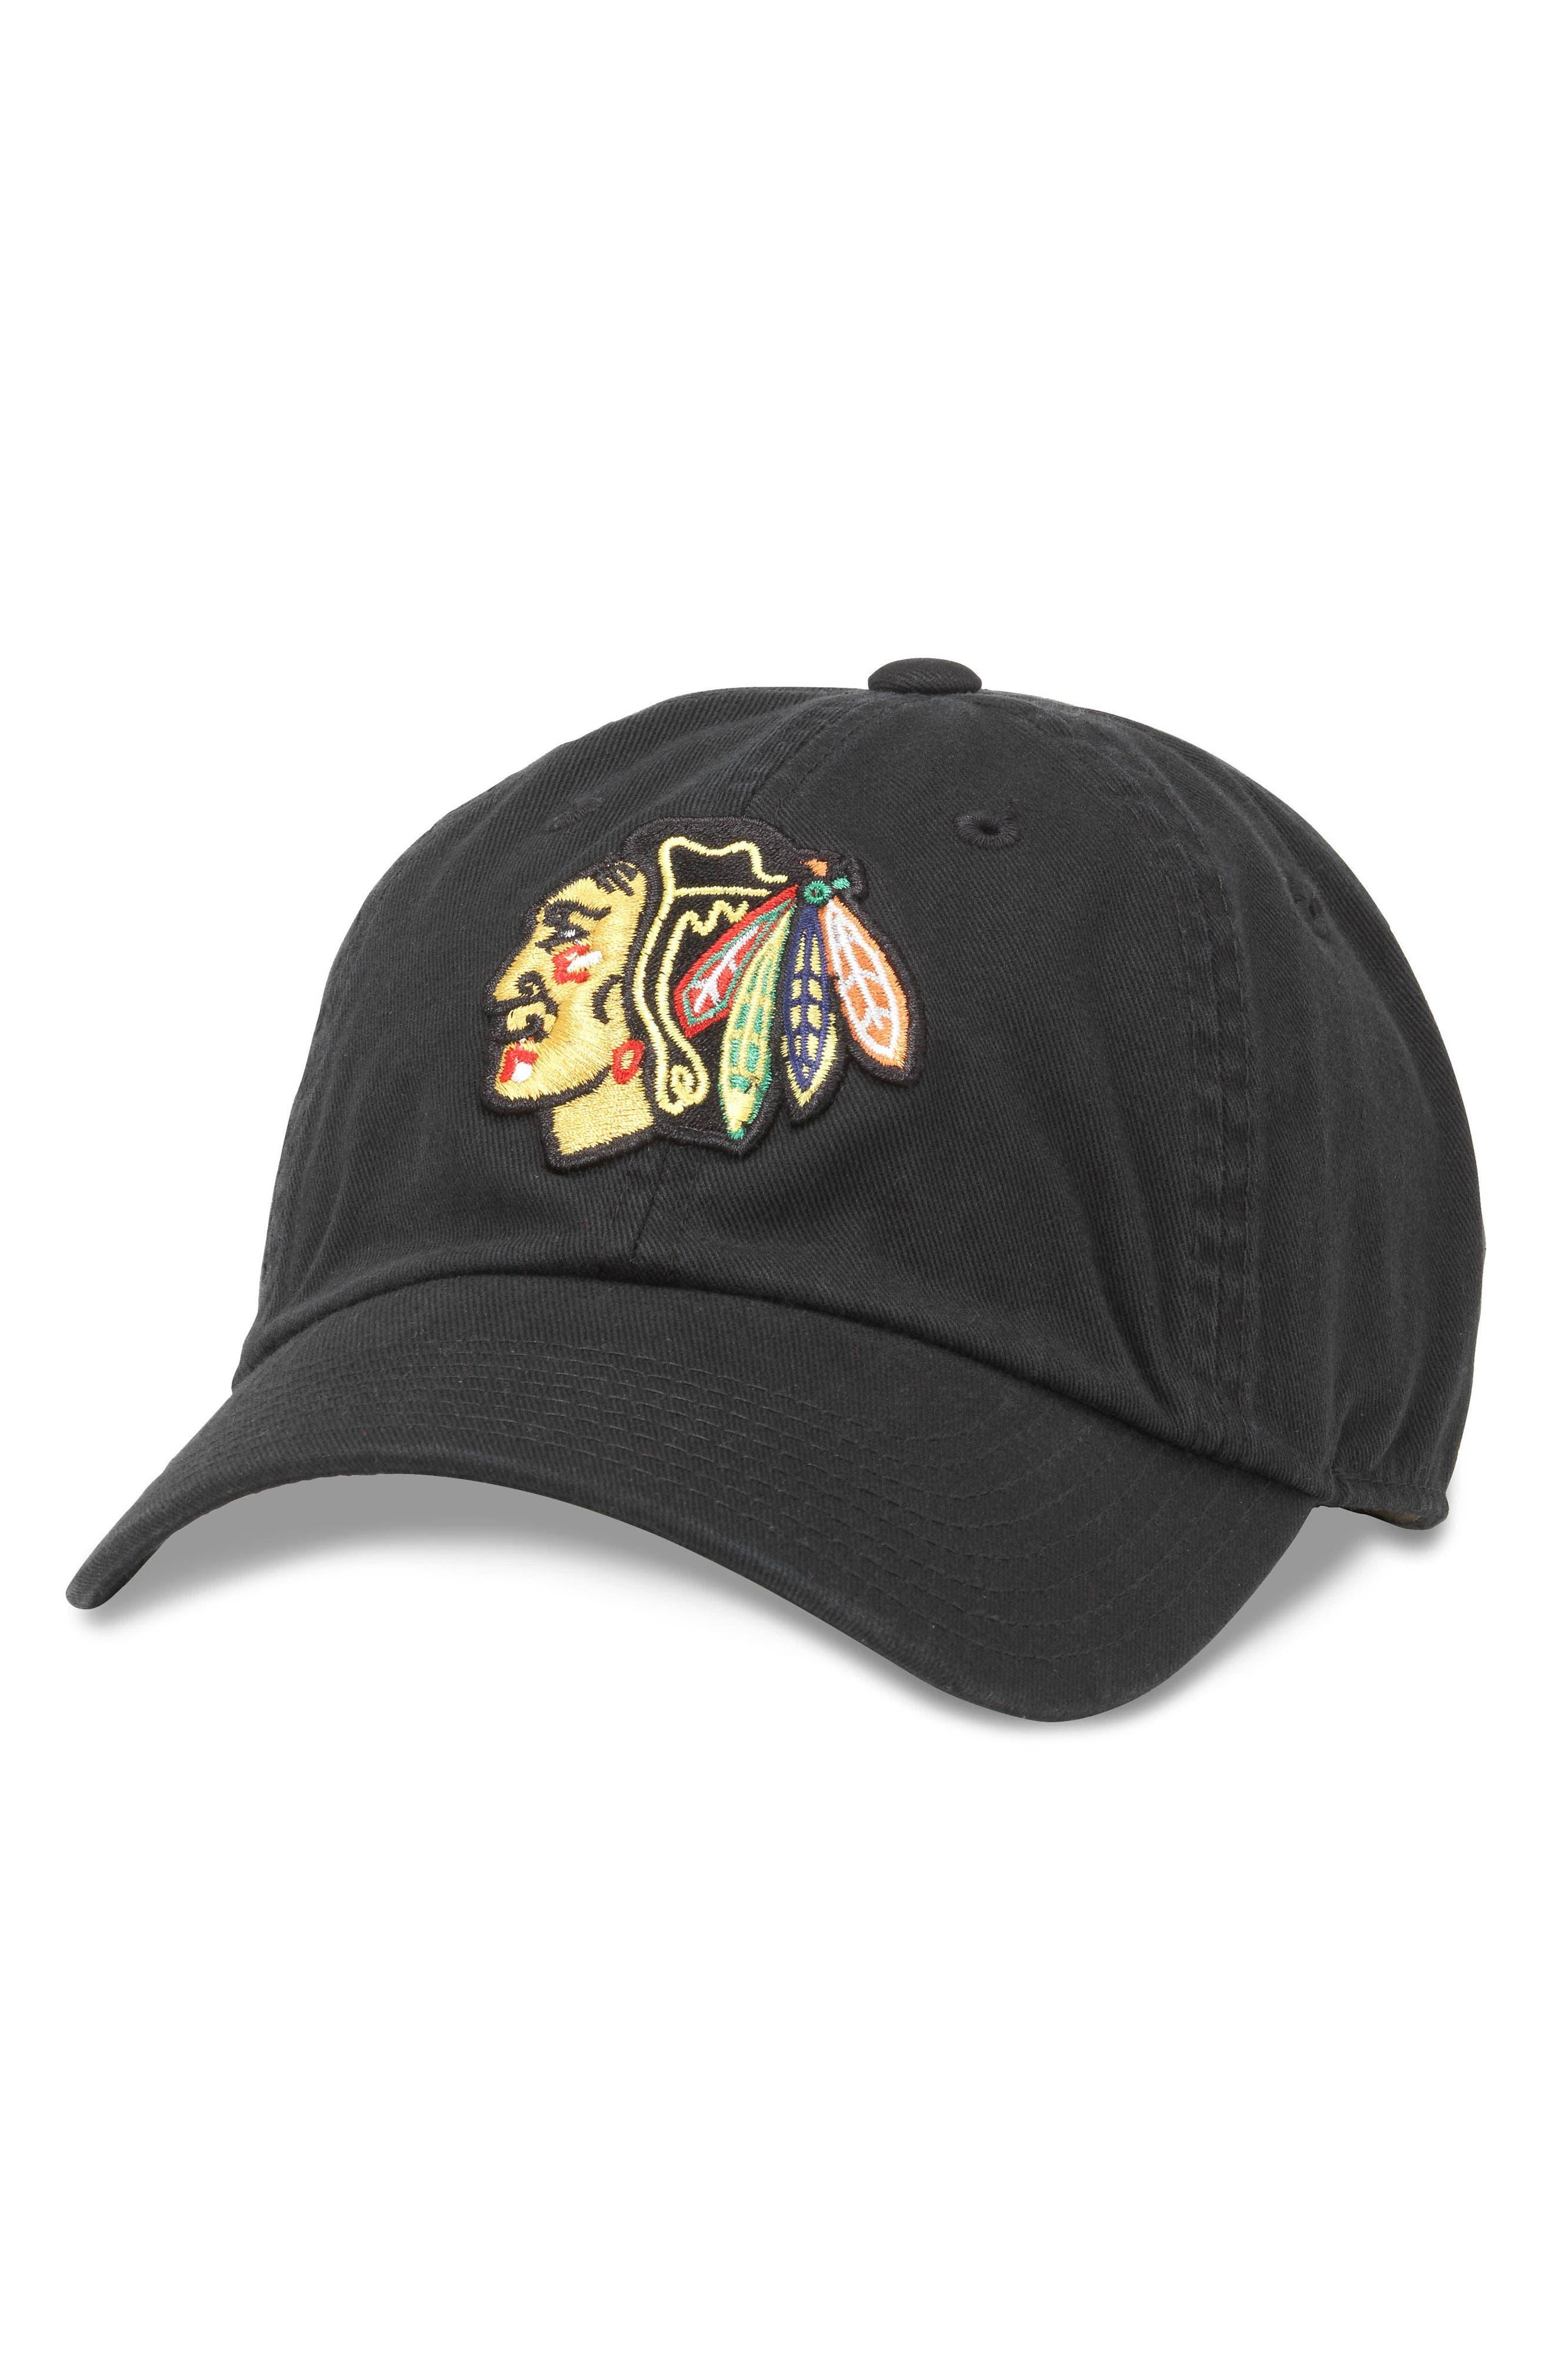 AMERICAN NEEDLE Blue Line Chicago Blackhawks Baseball Hat